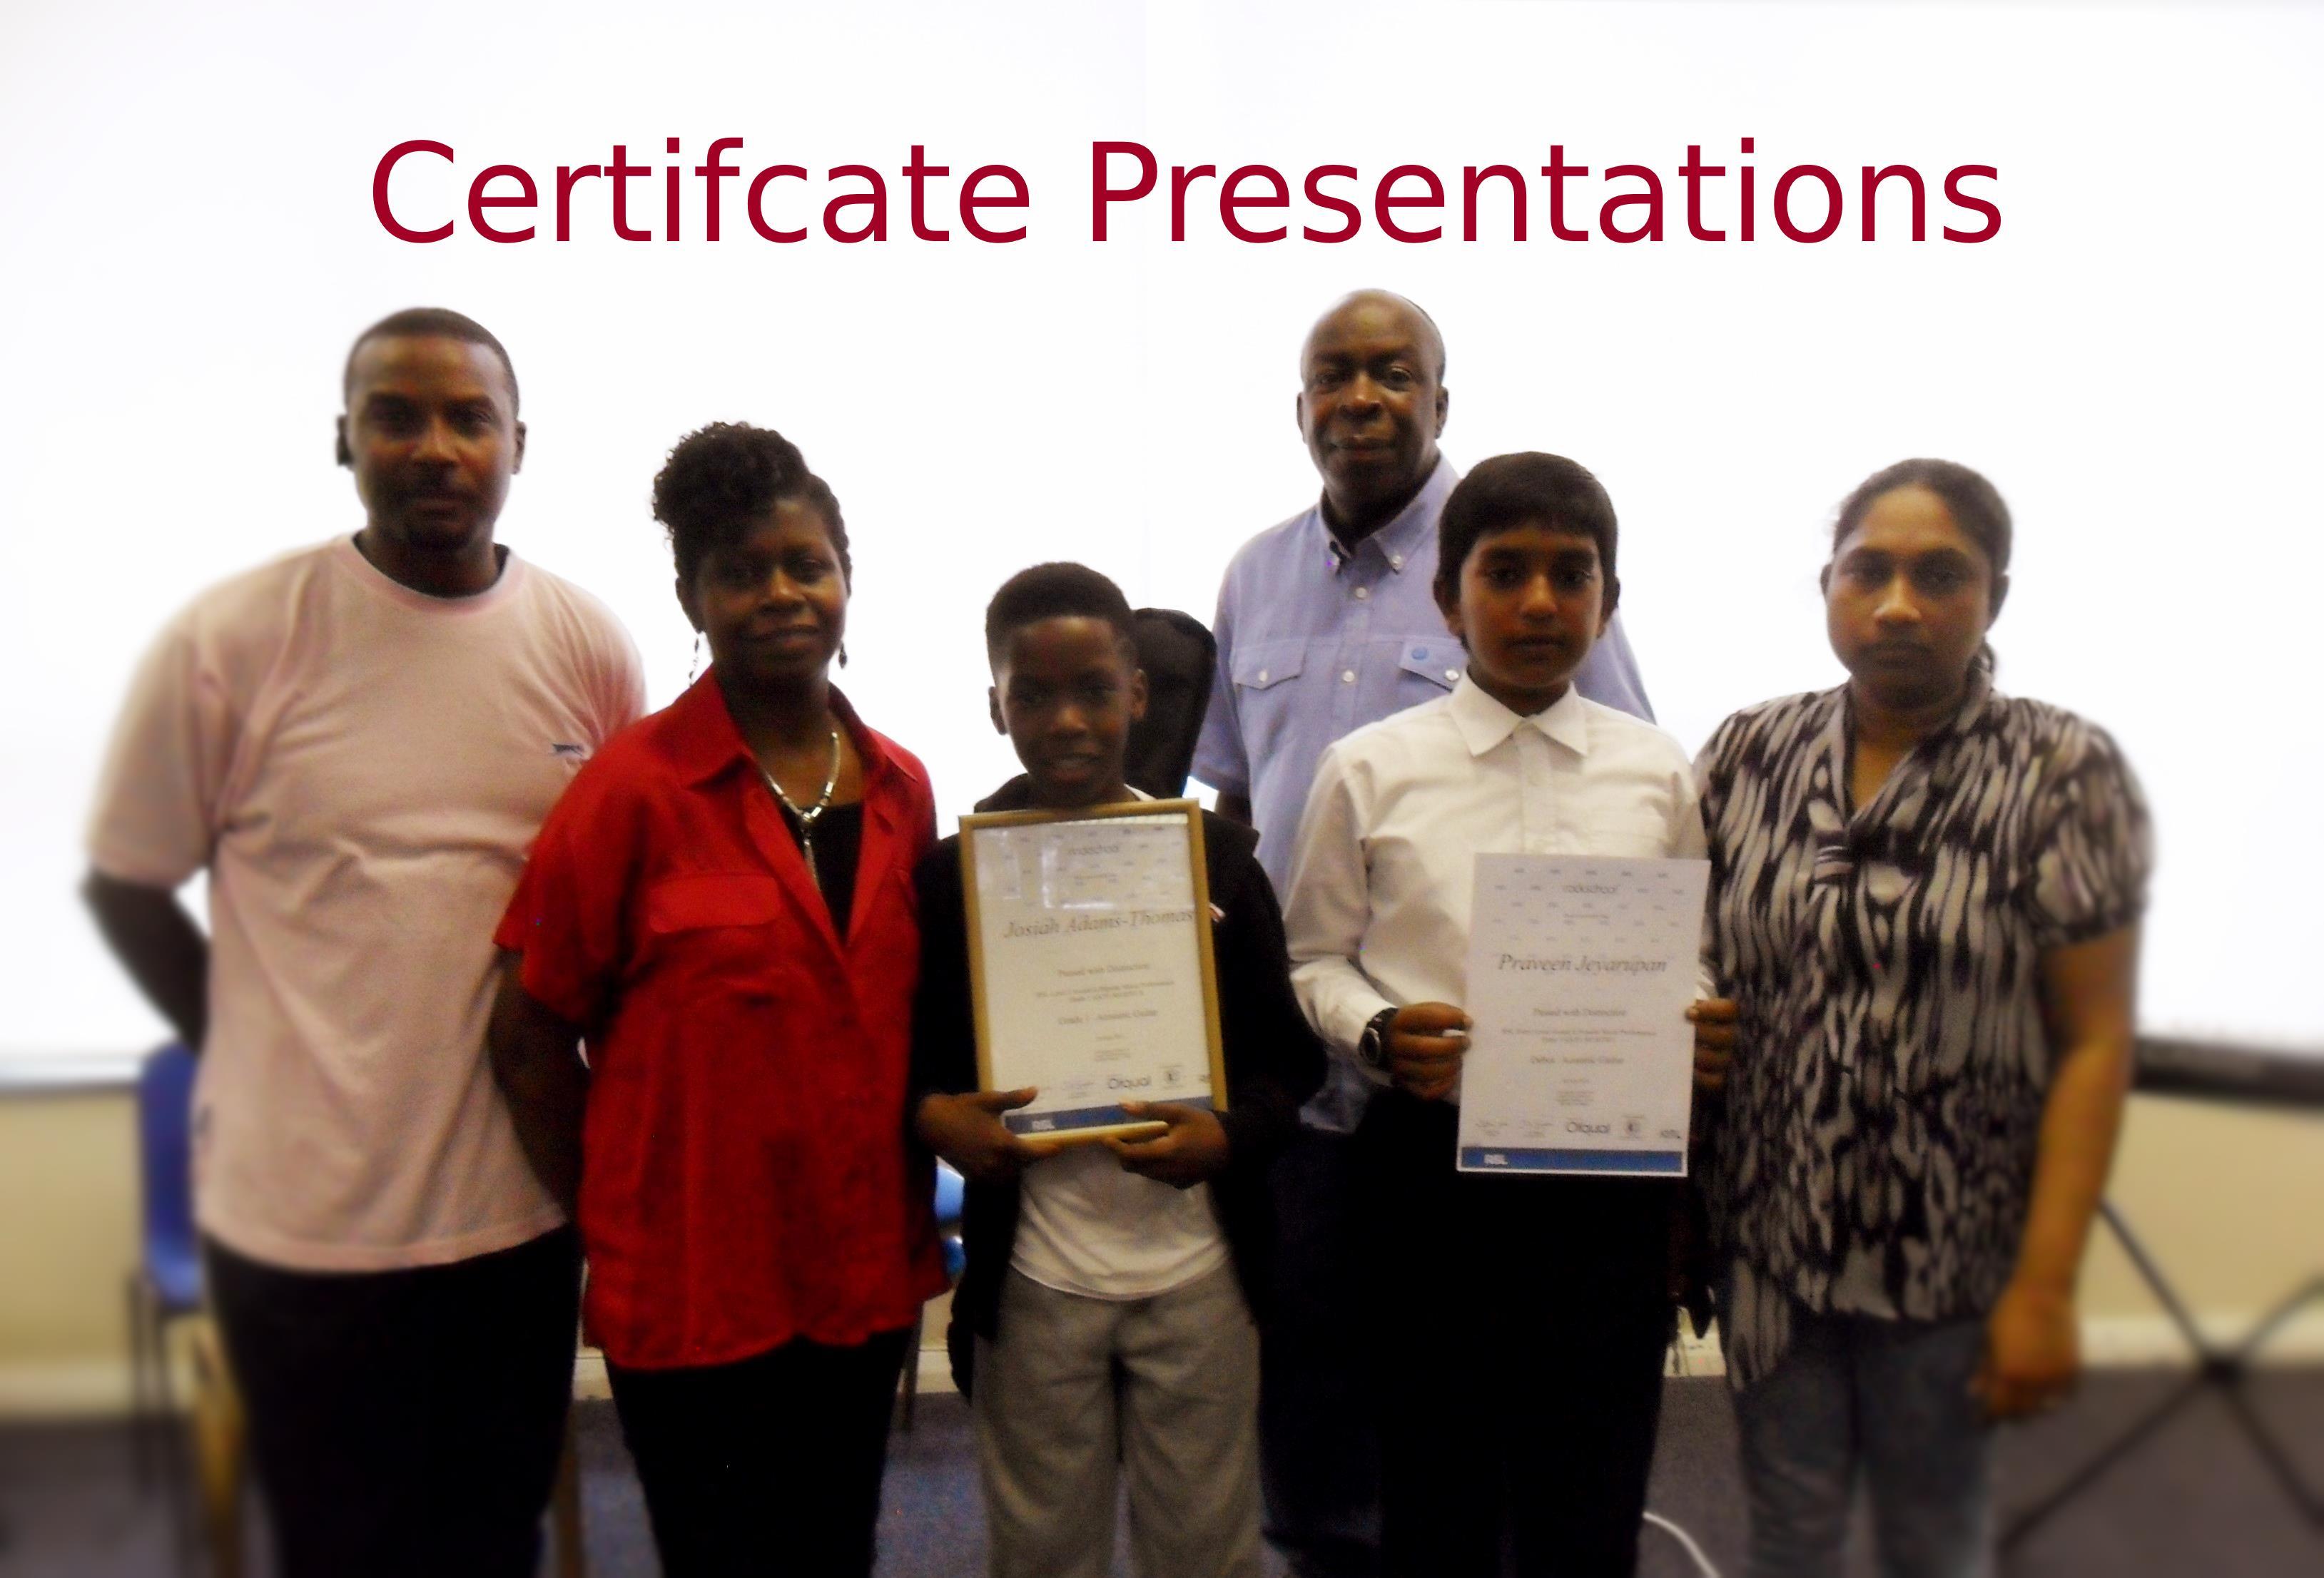 Certifcate Presentations